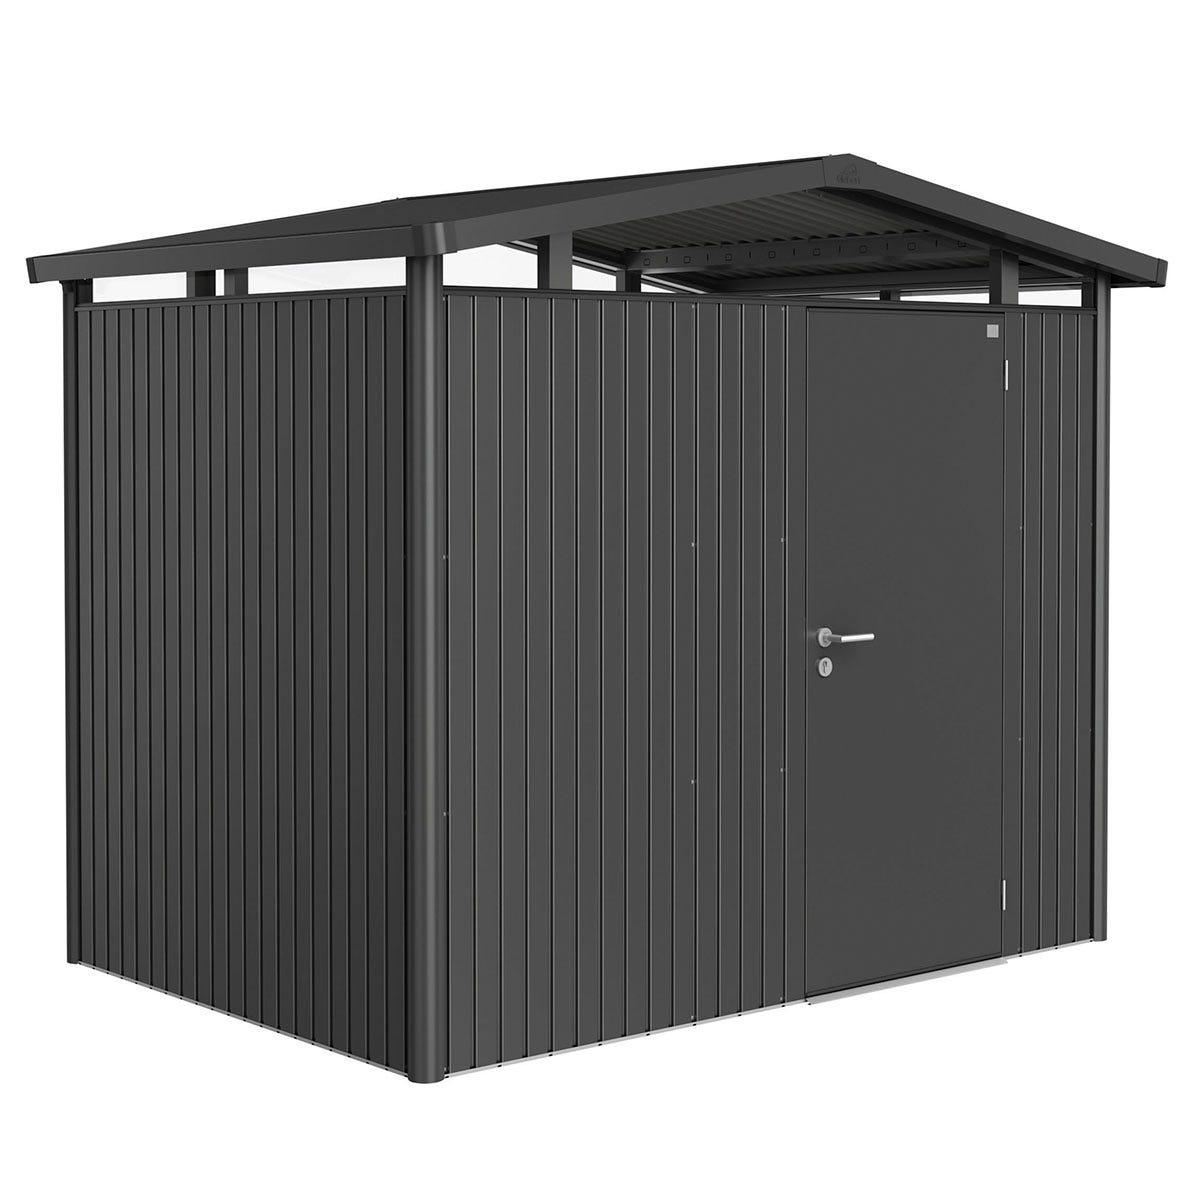 Biohort Panorama Metal Shed P2 Standard Door 9' x 6' 5'' - Dark Grey